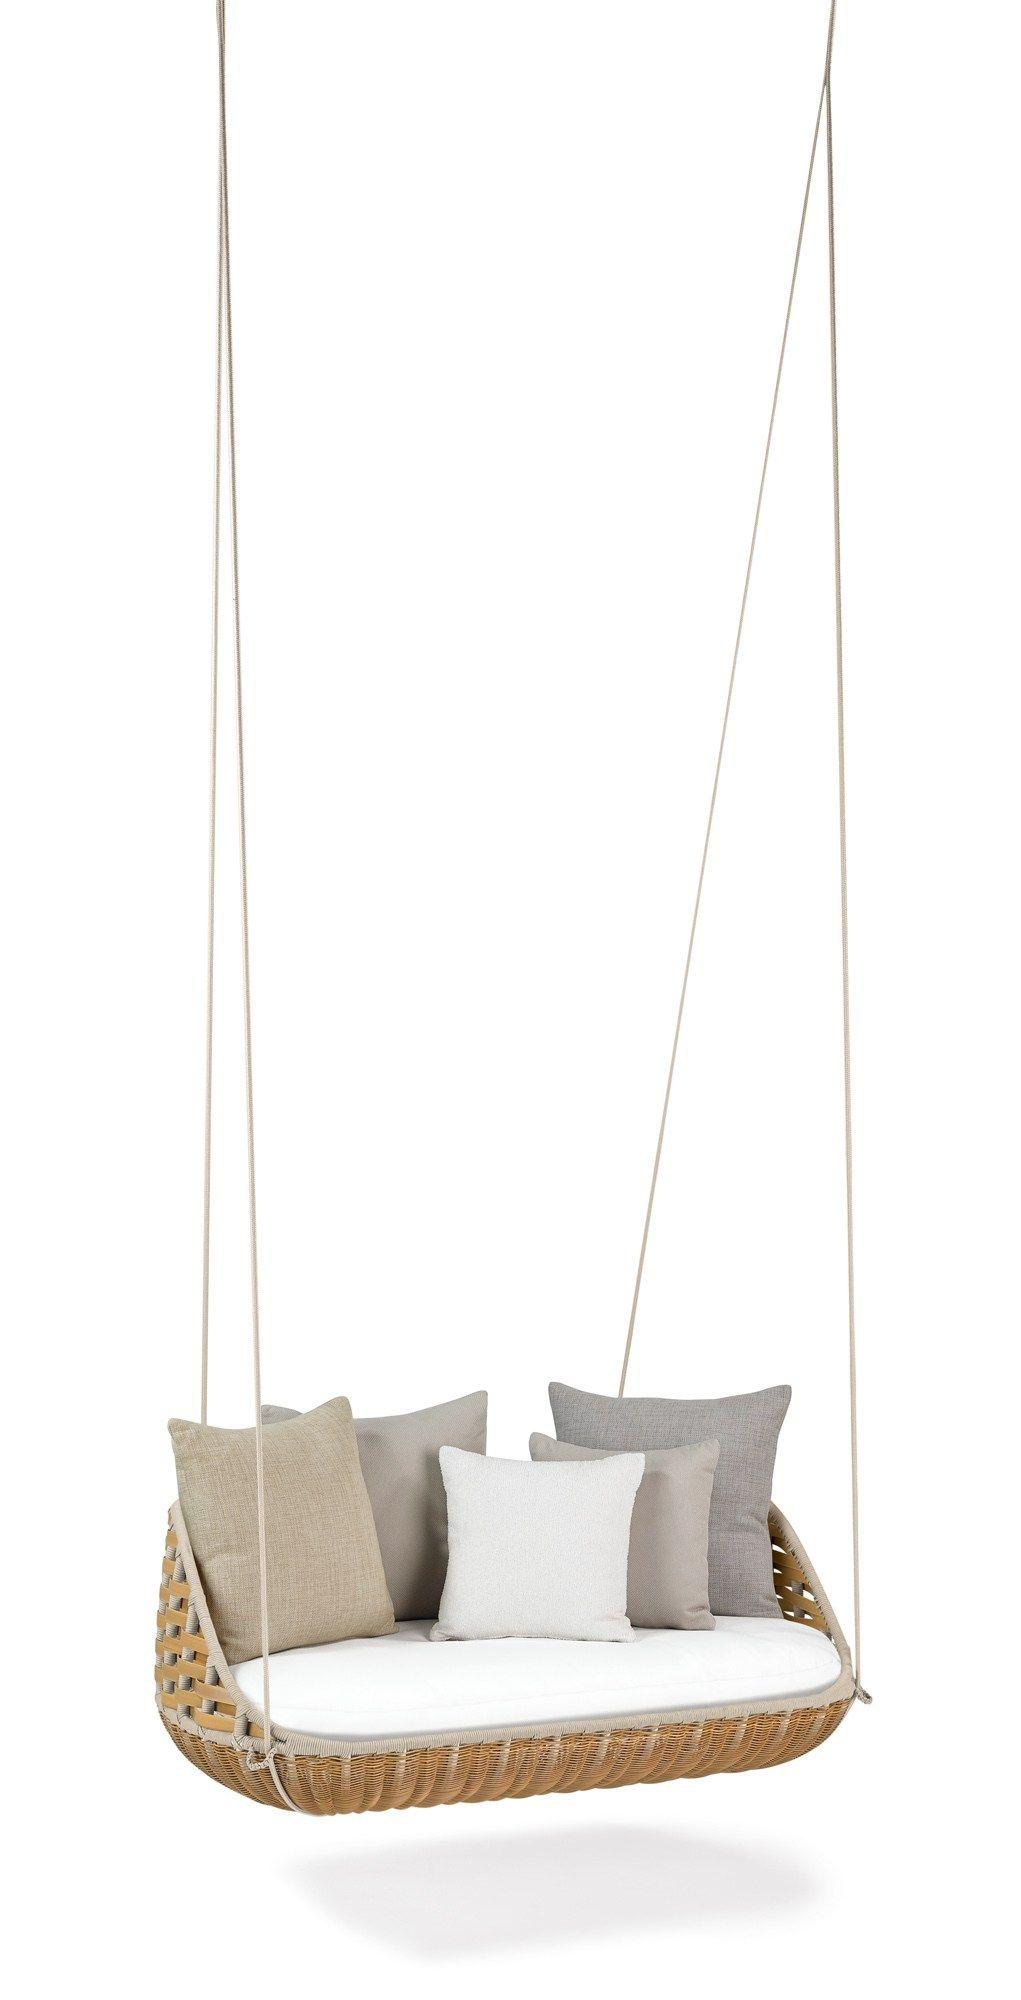 Prime 2 Seater Garden Hanging Chair Swingus Garden Hanging Chair Machost Co Dining Chair Design Ideas Machostcouk